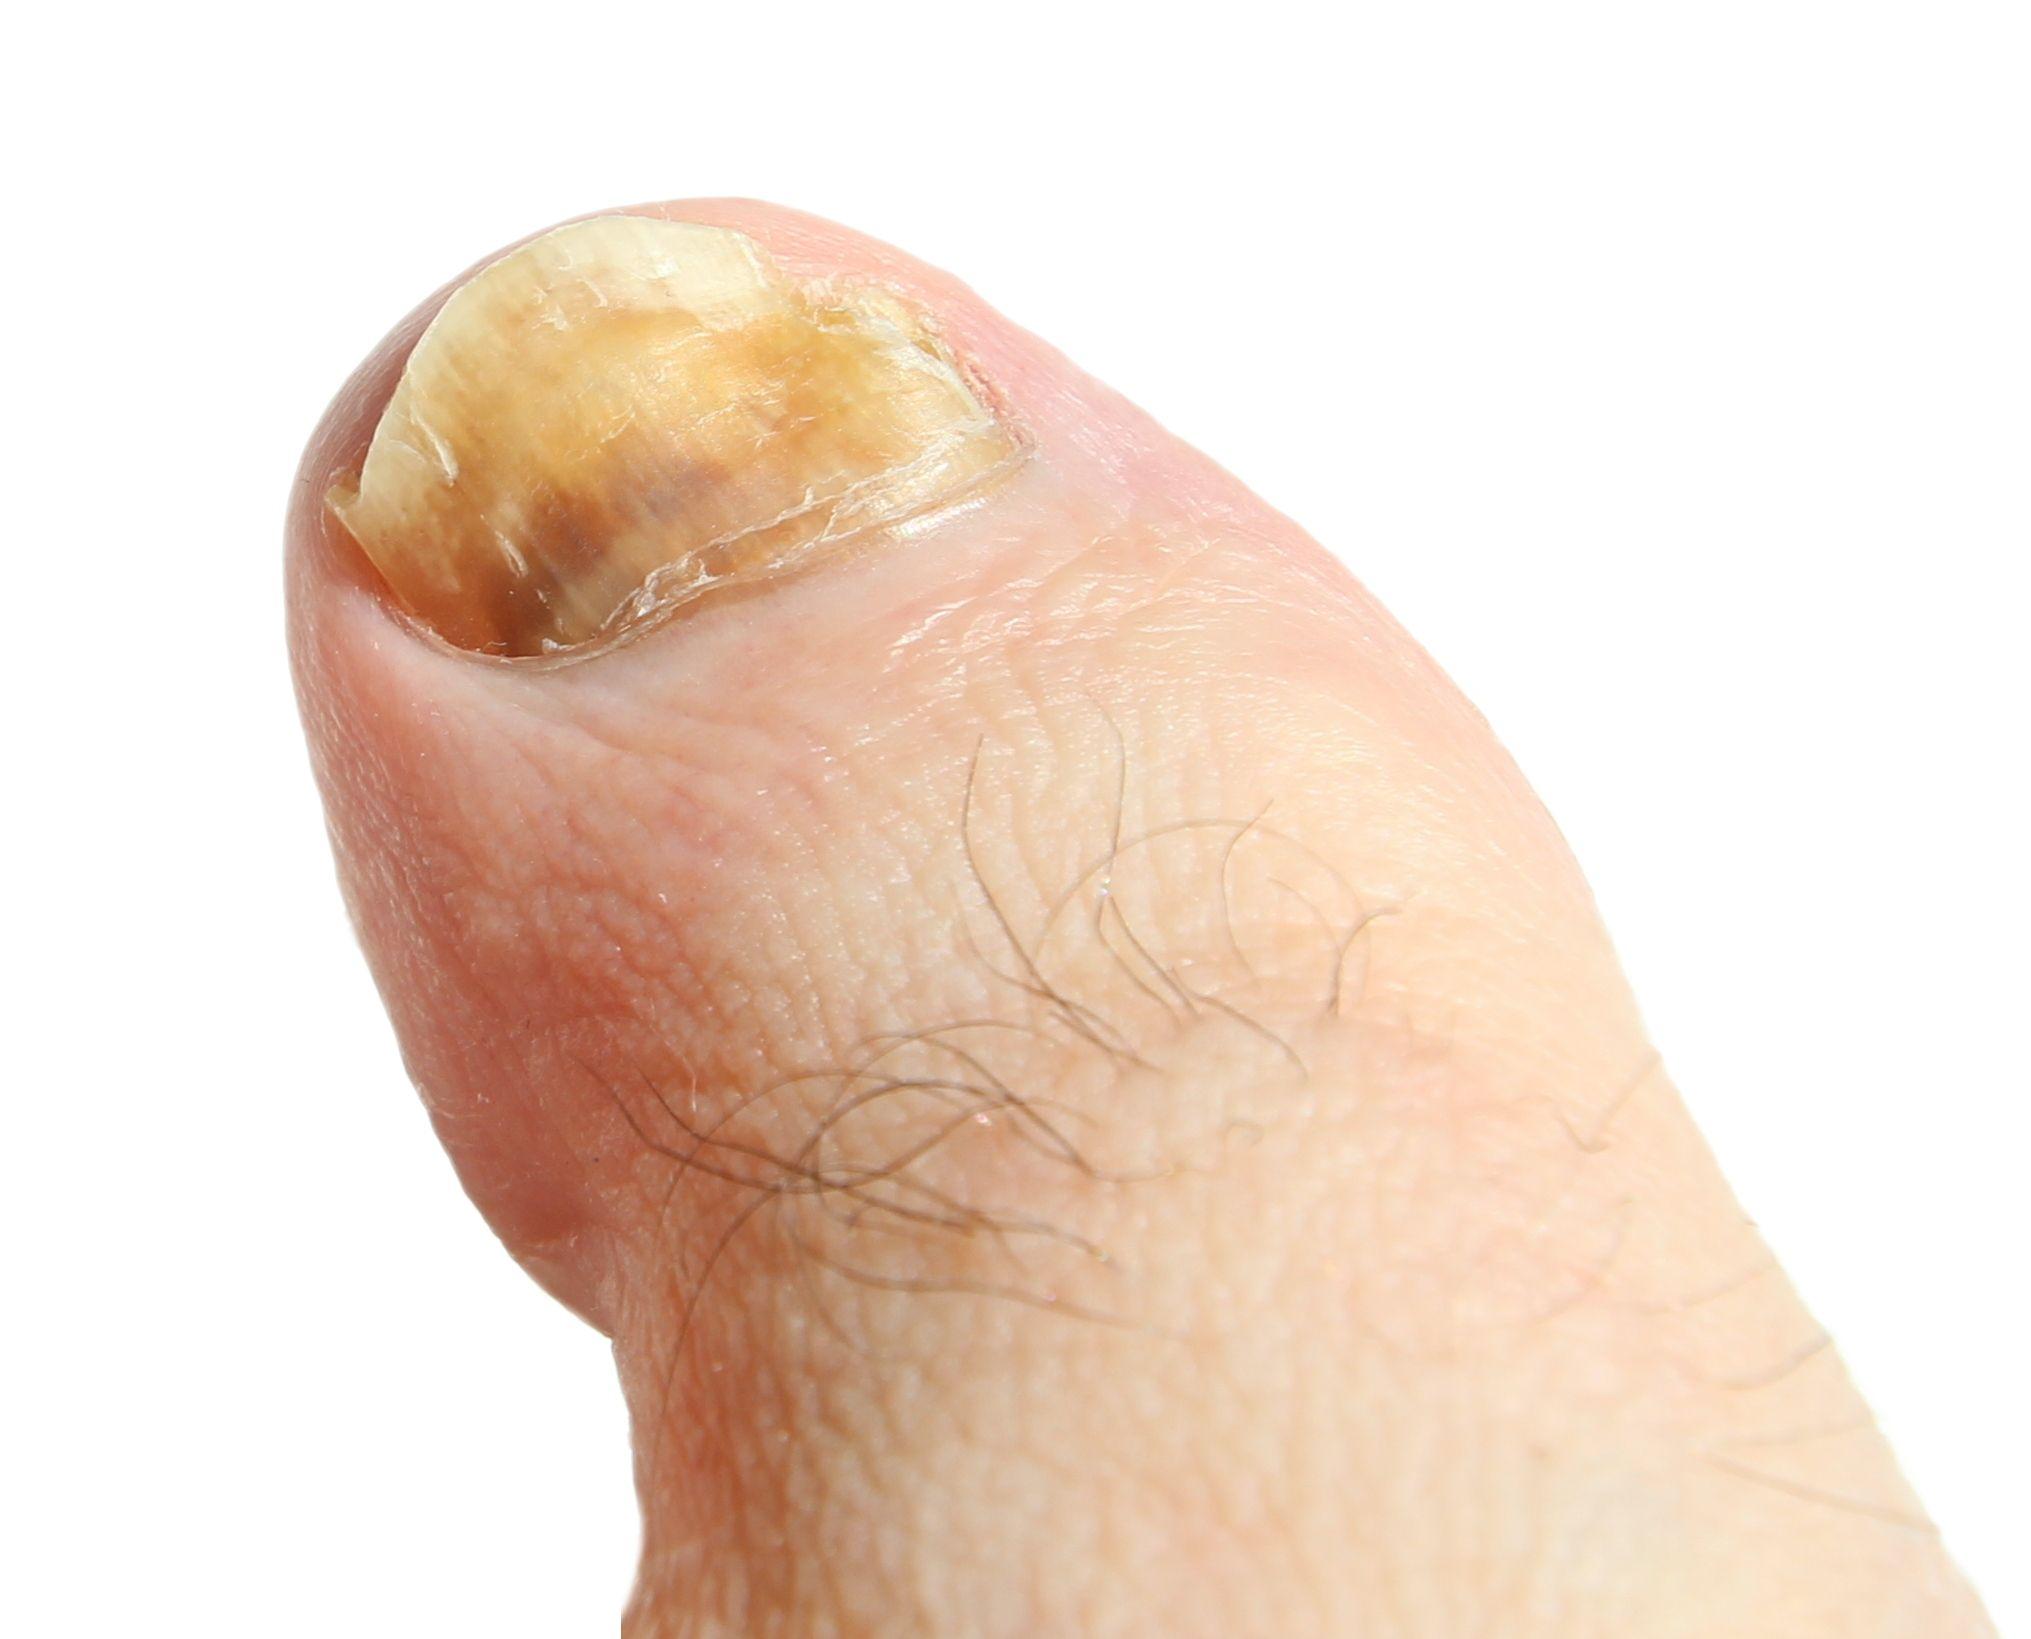 Fungus Under Toenail Lotrimin Toenail Fungal Infection Black | Cure ...